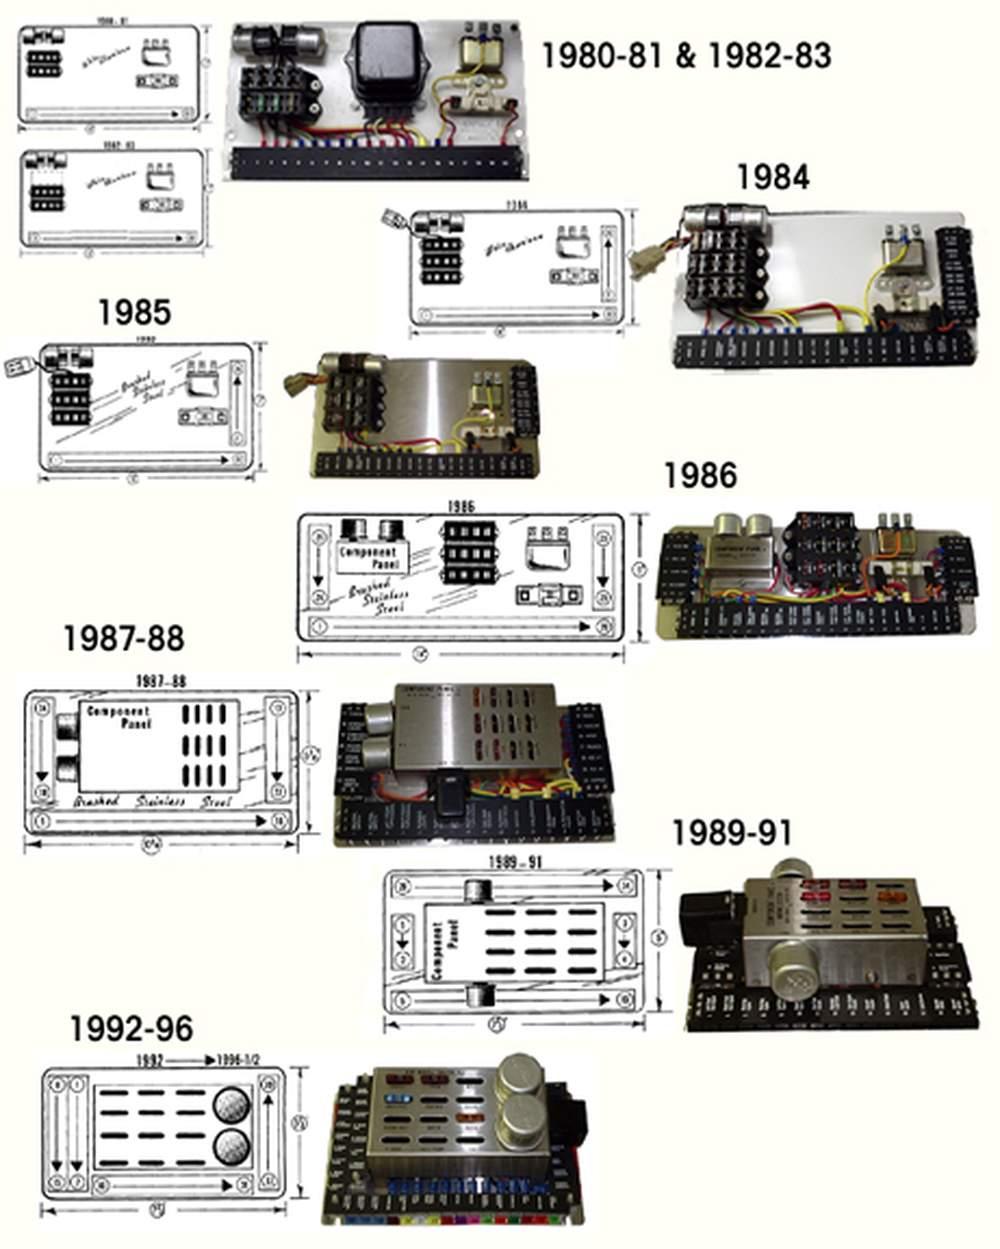 Wiring Kit Panel History  1980 -1996 1/2